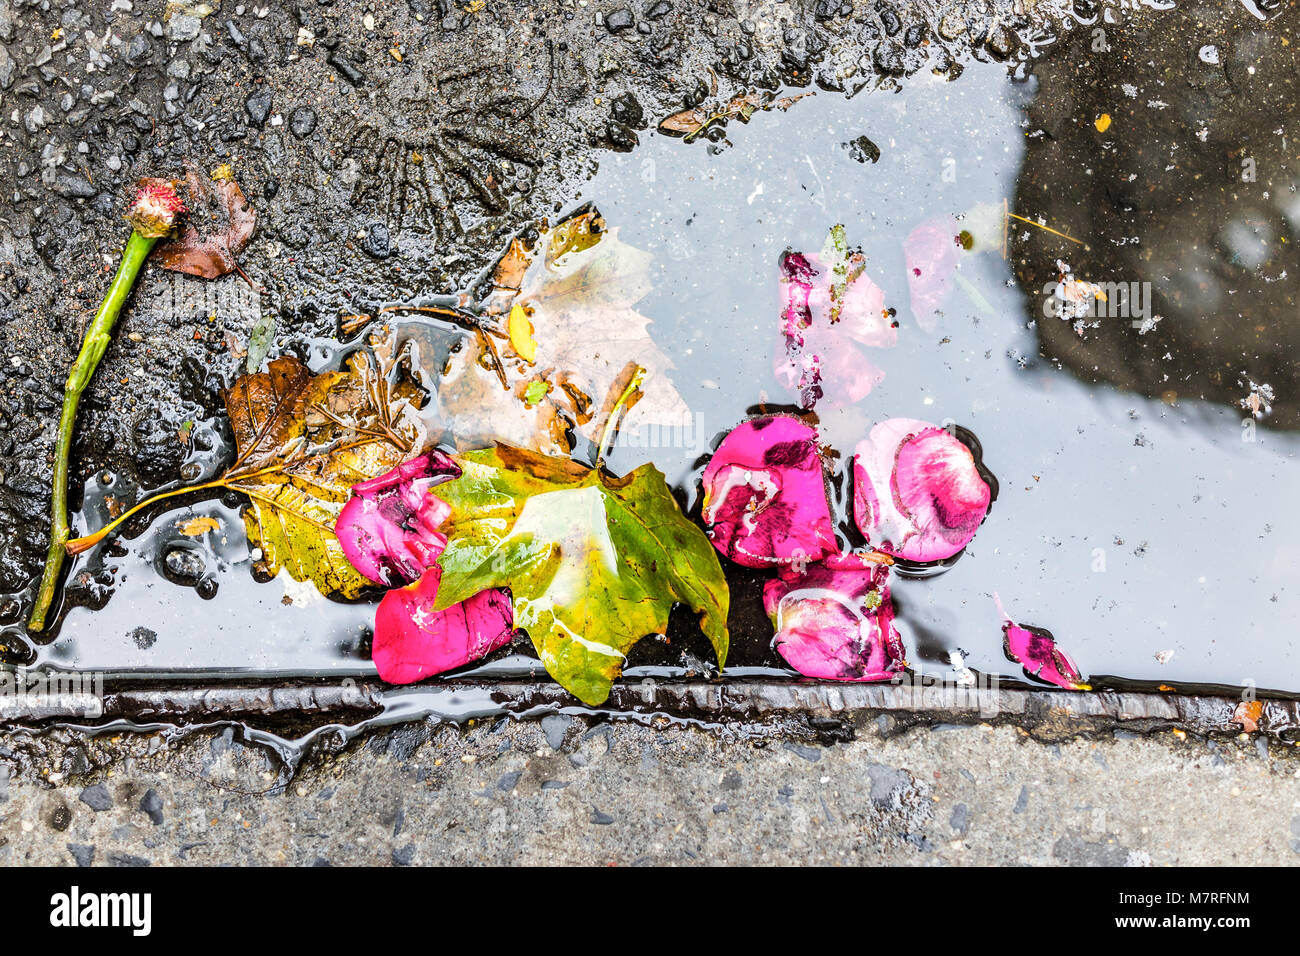 Primer plano de una vibrante rosa flor rosa roja, deja en la piscina de agua, charco canalones en la acera de la Imagen De Stock